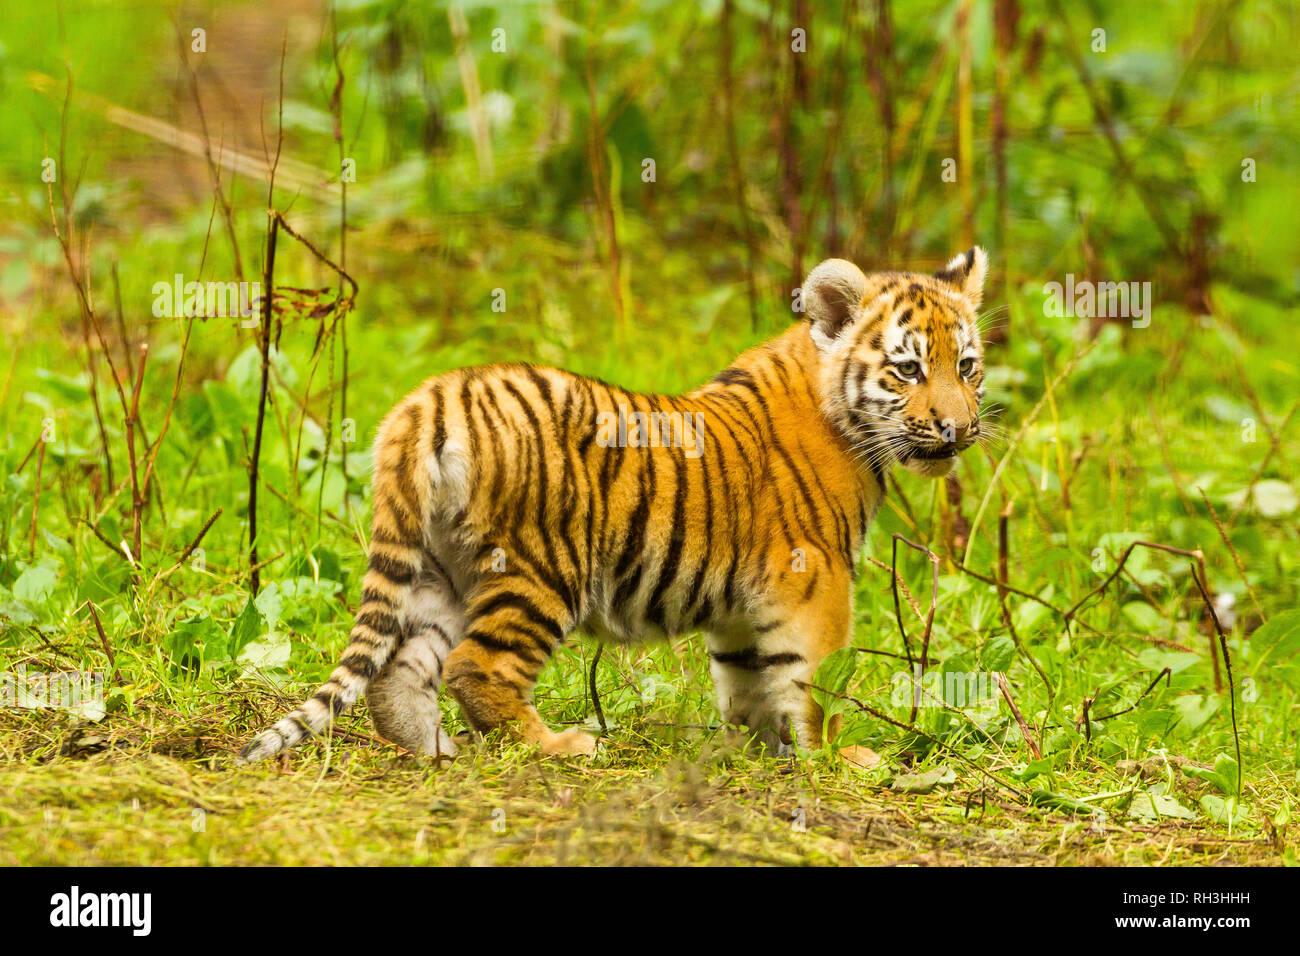 Amursibirische Tiger Cub Panthera Tigris Altaica Zu Fuß Durch